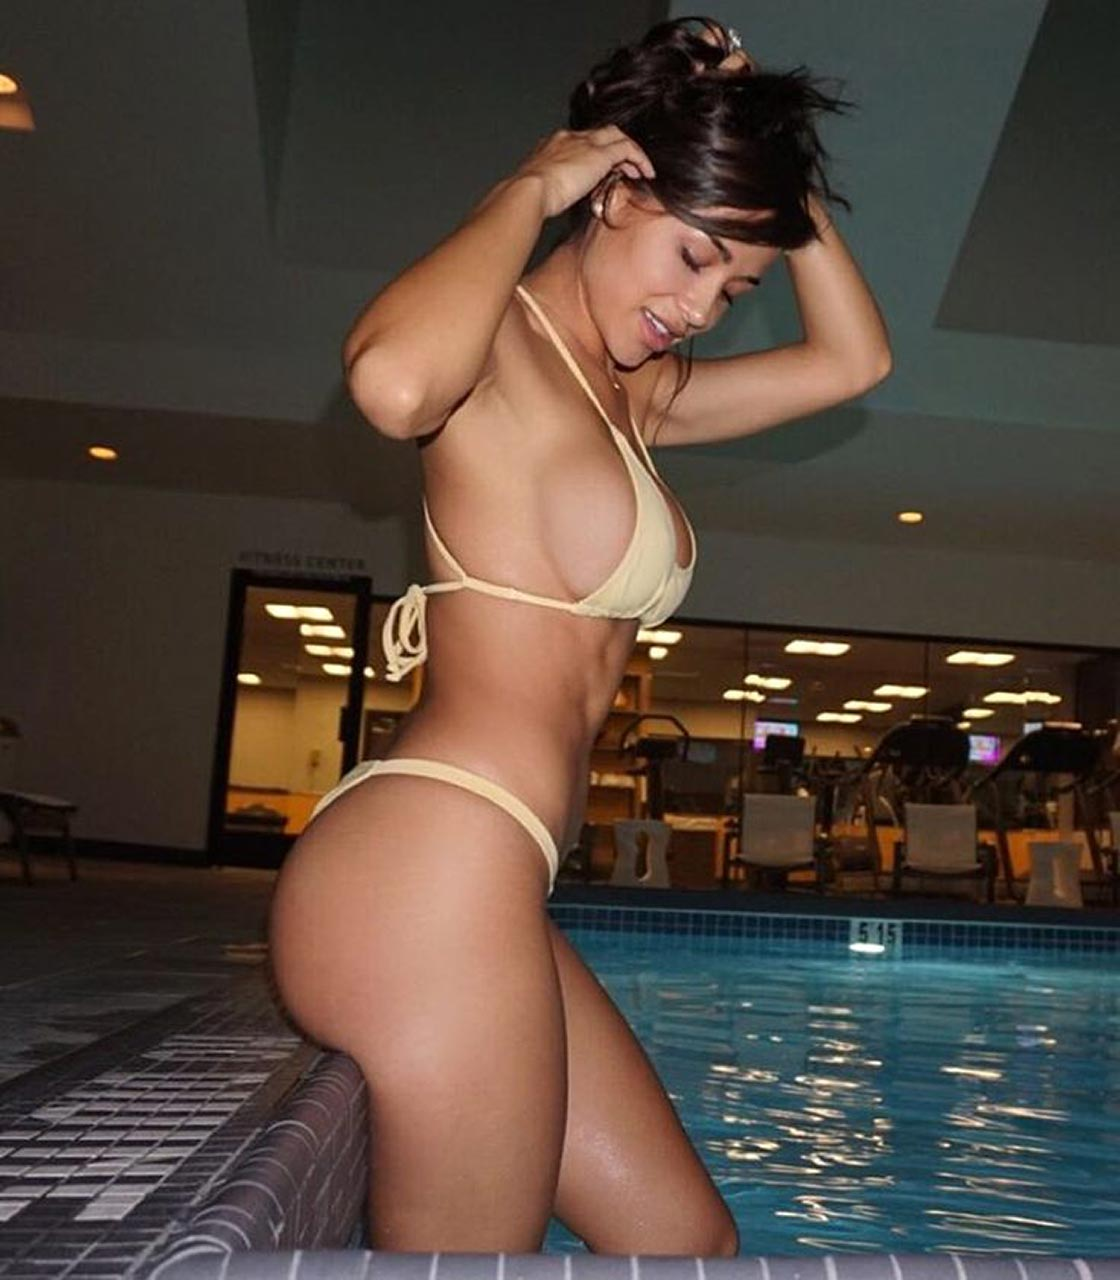 Ana Cheri Nude Video ana cheri nude photos leaked online - scandal planet